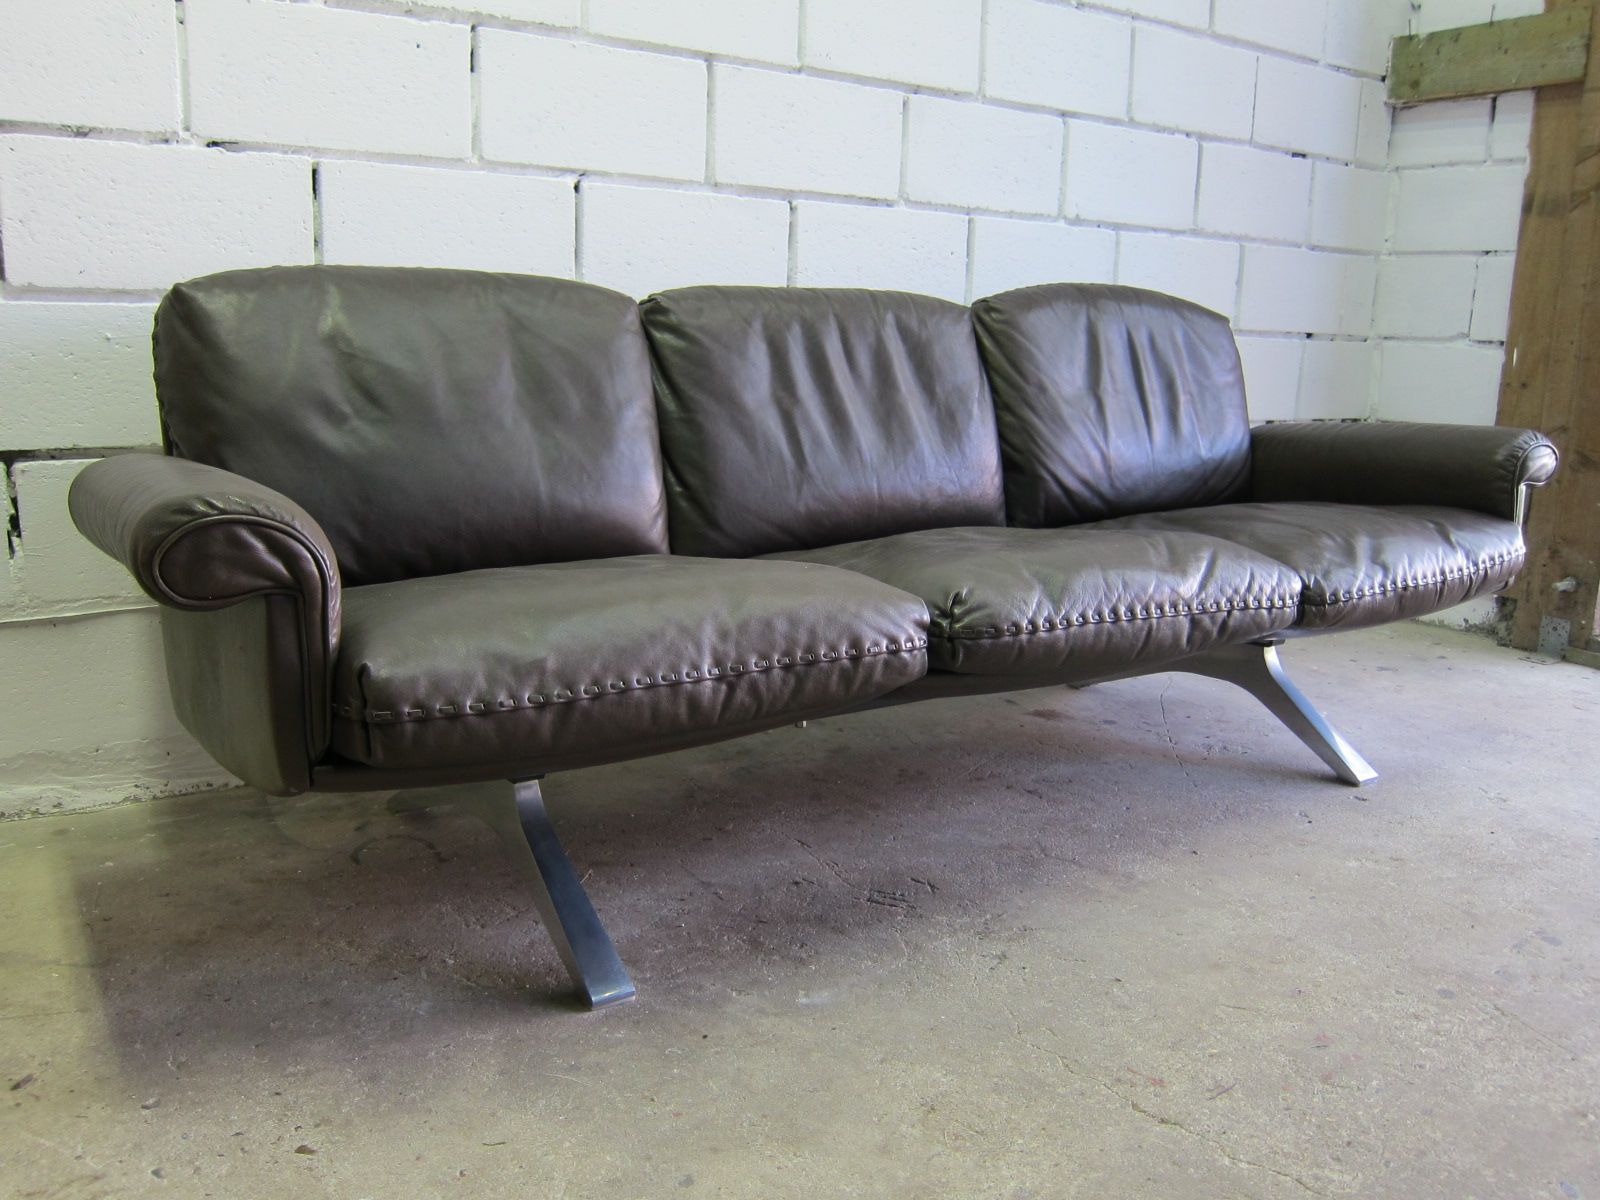 vintage ds 31 3 sitzer sofa drehsessel von de sede bei pamono kaufen. Black Bedroom Furniture Sets. Home Design Ideas